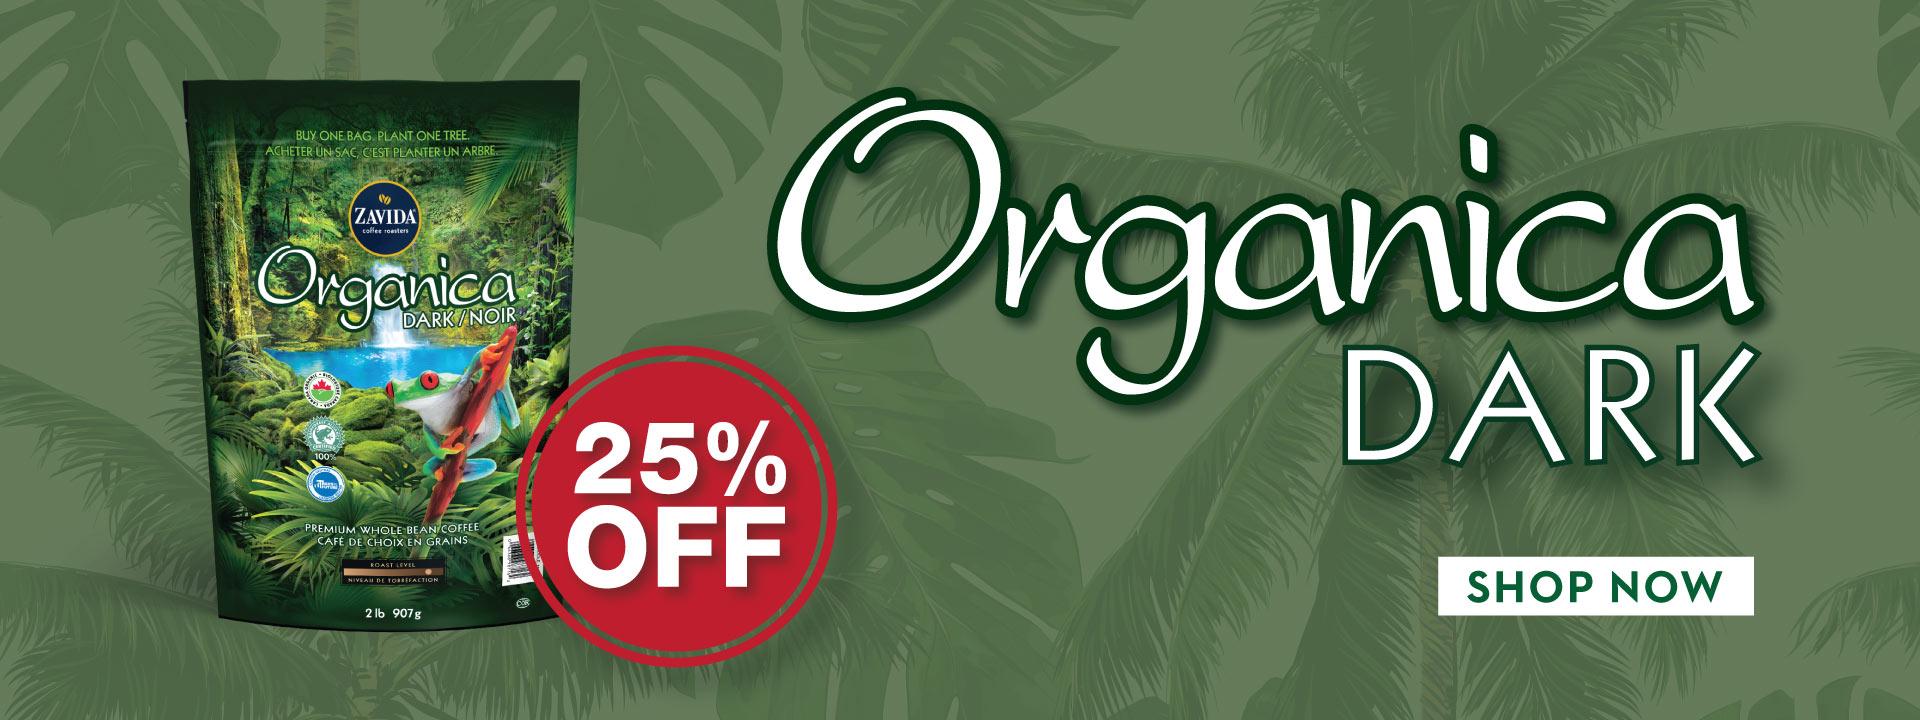 organica dark